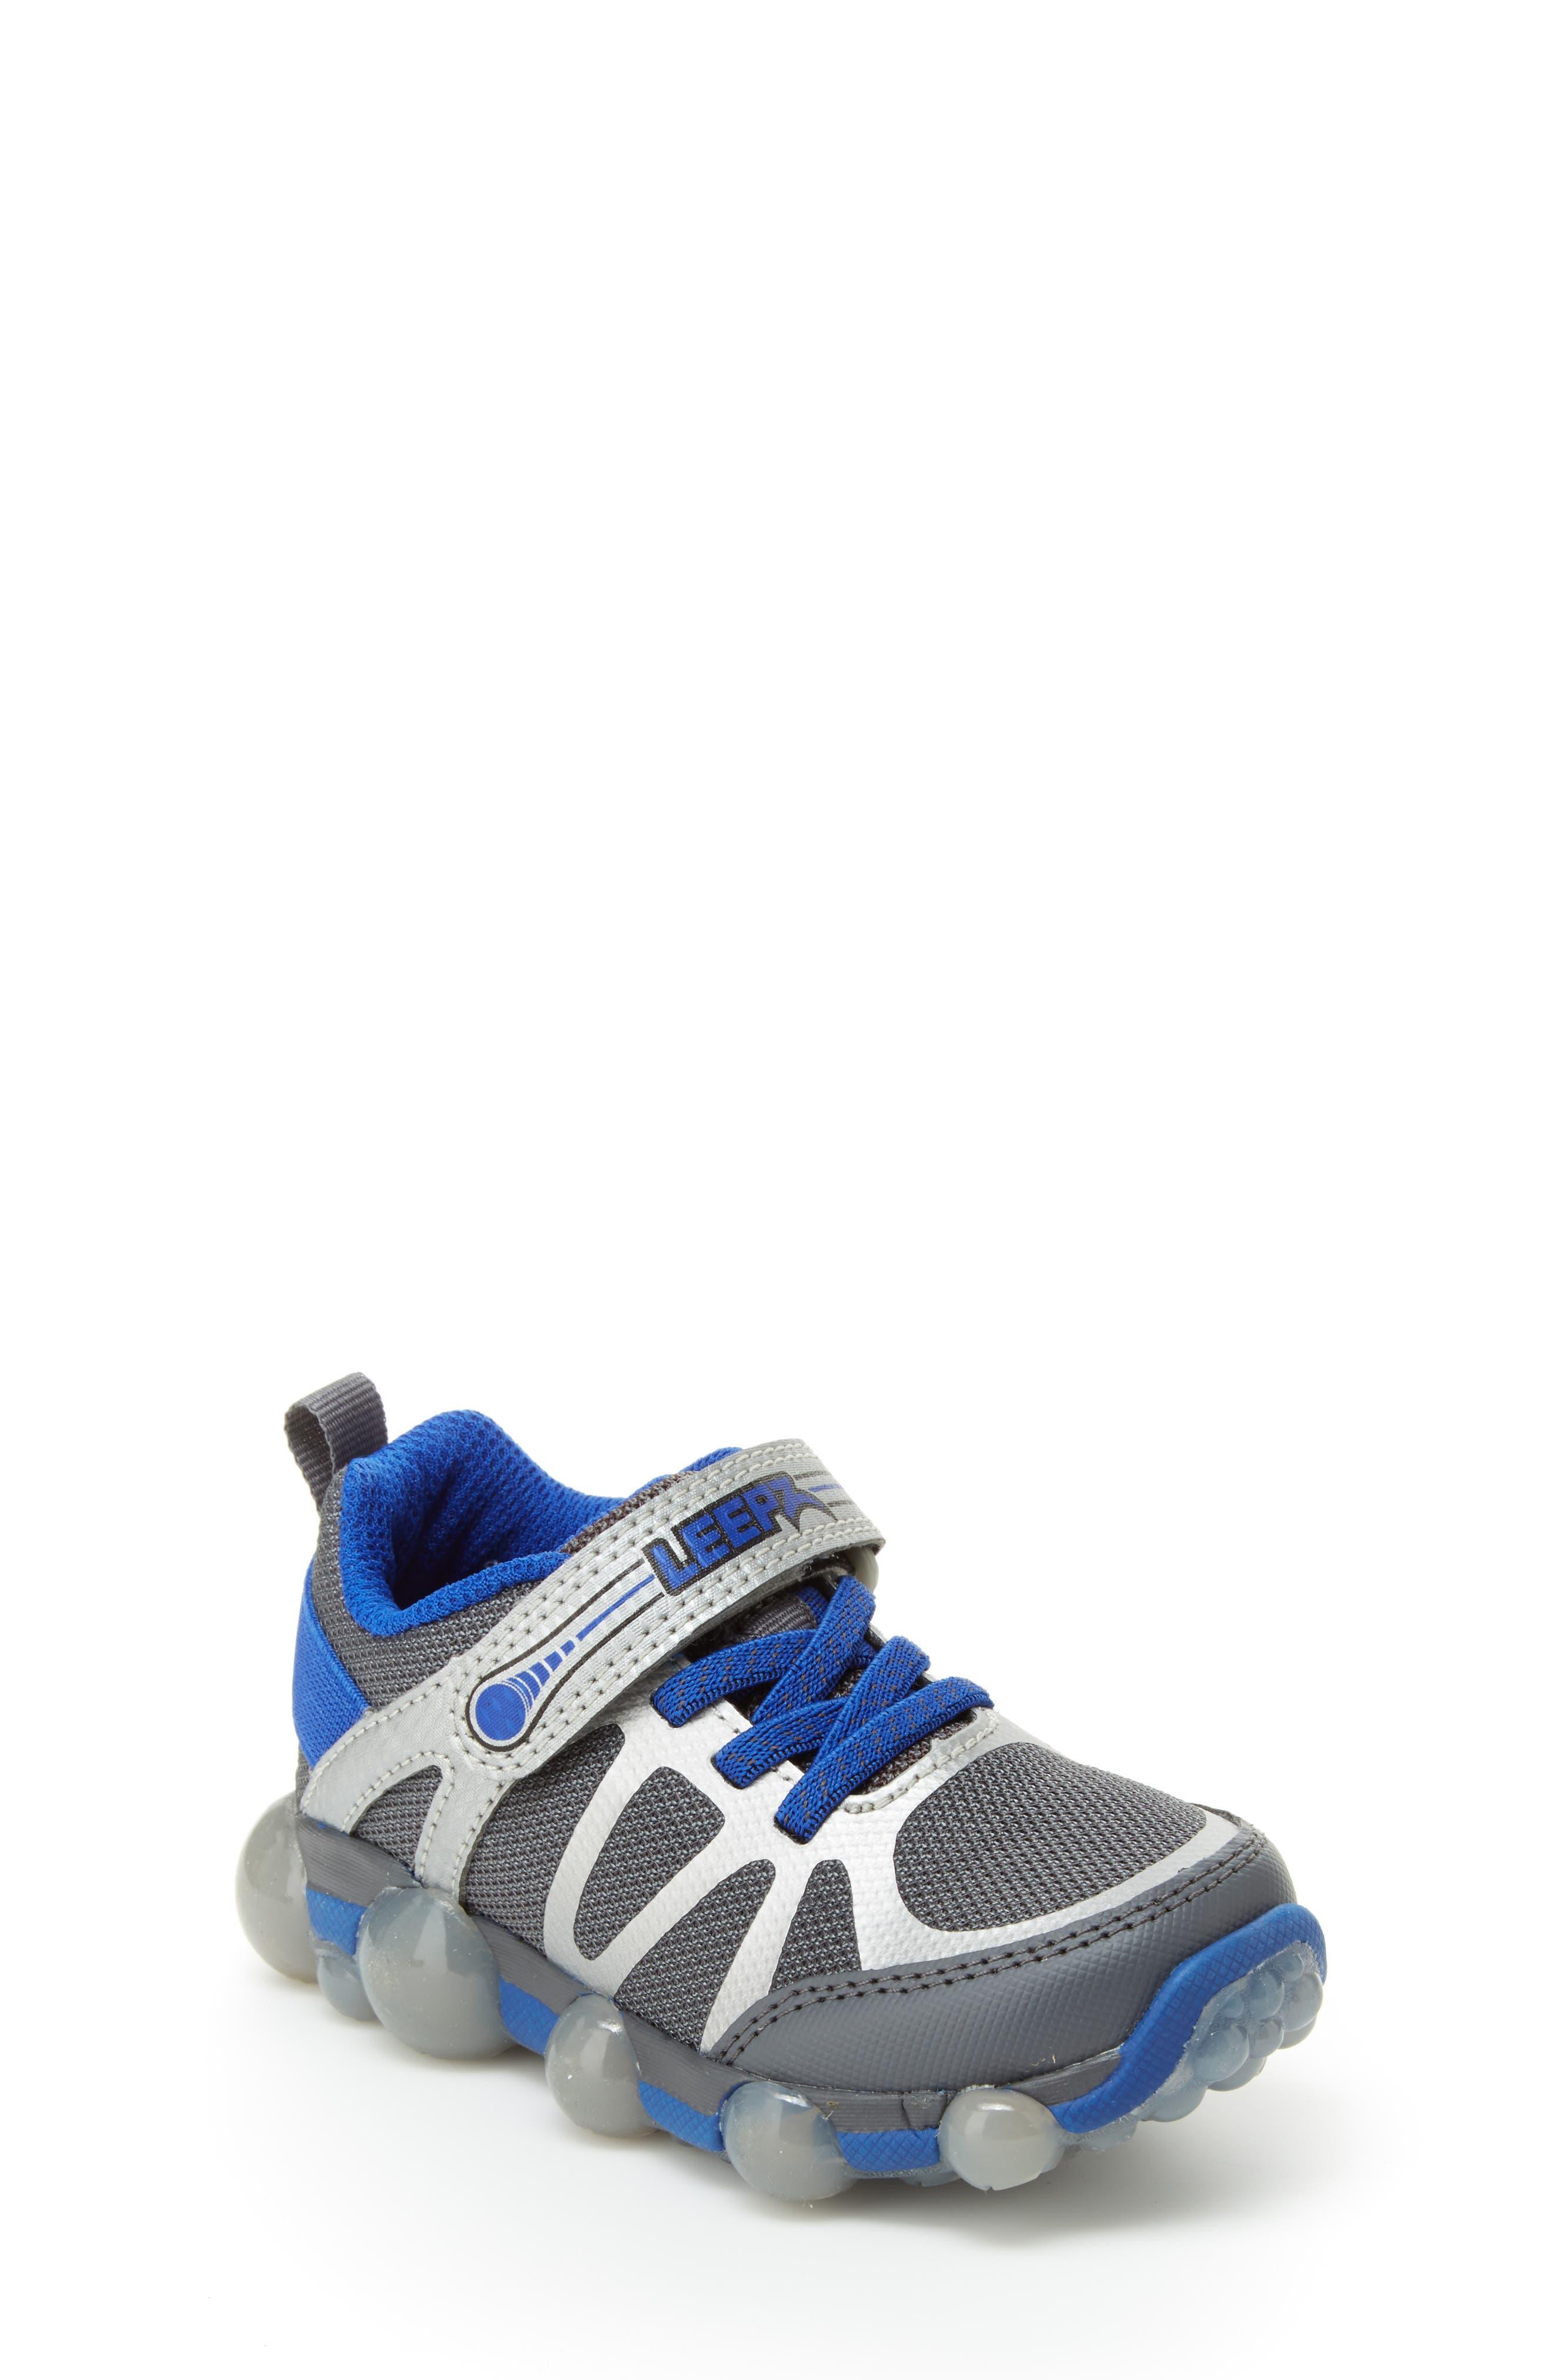 Leepz 3.0 Light-Up Sneaker,                             Main thumbnail 1, color,                             DARK GREY/ BLUE